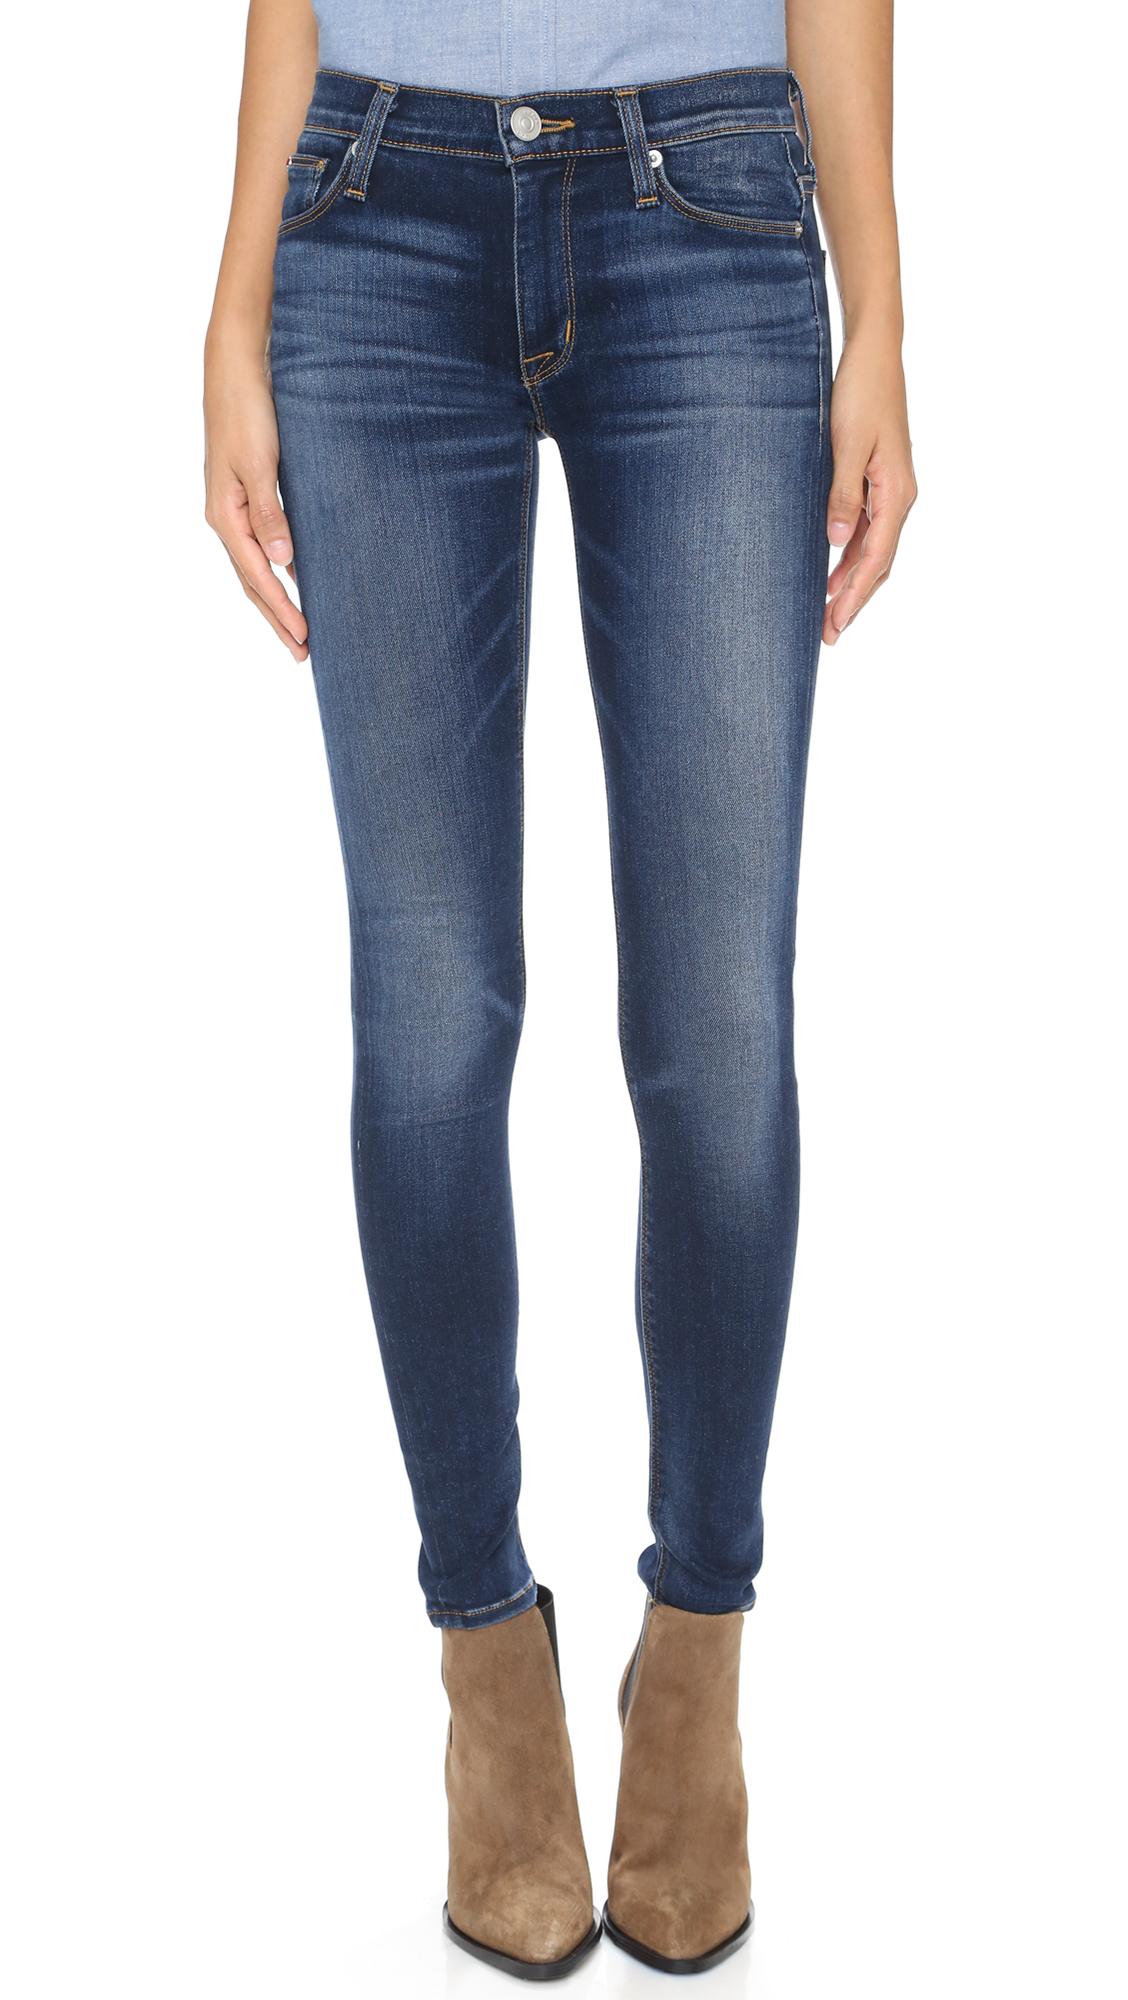 Hudson Nico Elysian Mid Rise Skinny Jeans - Blue Gold at Shopbop